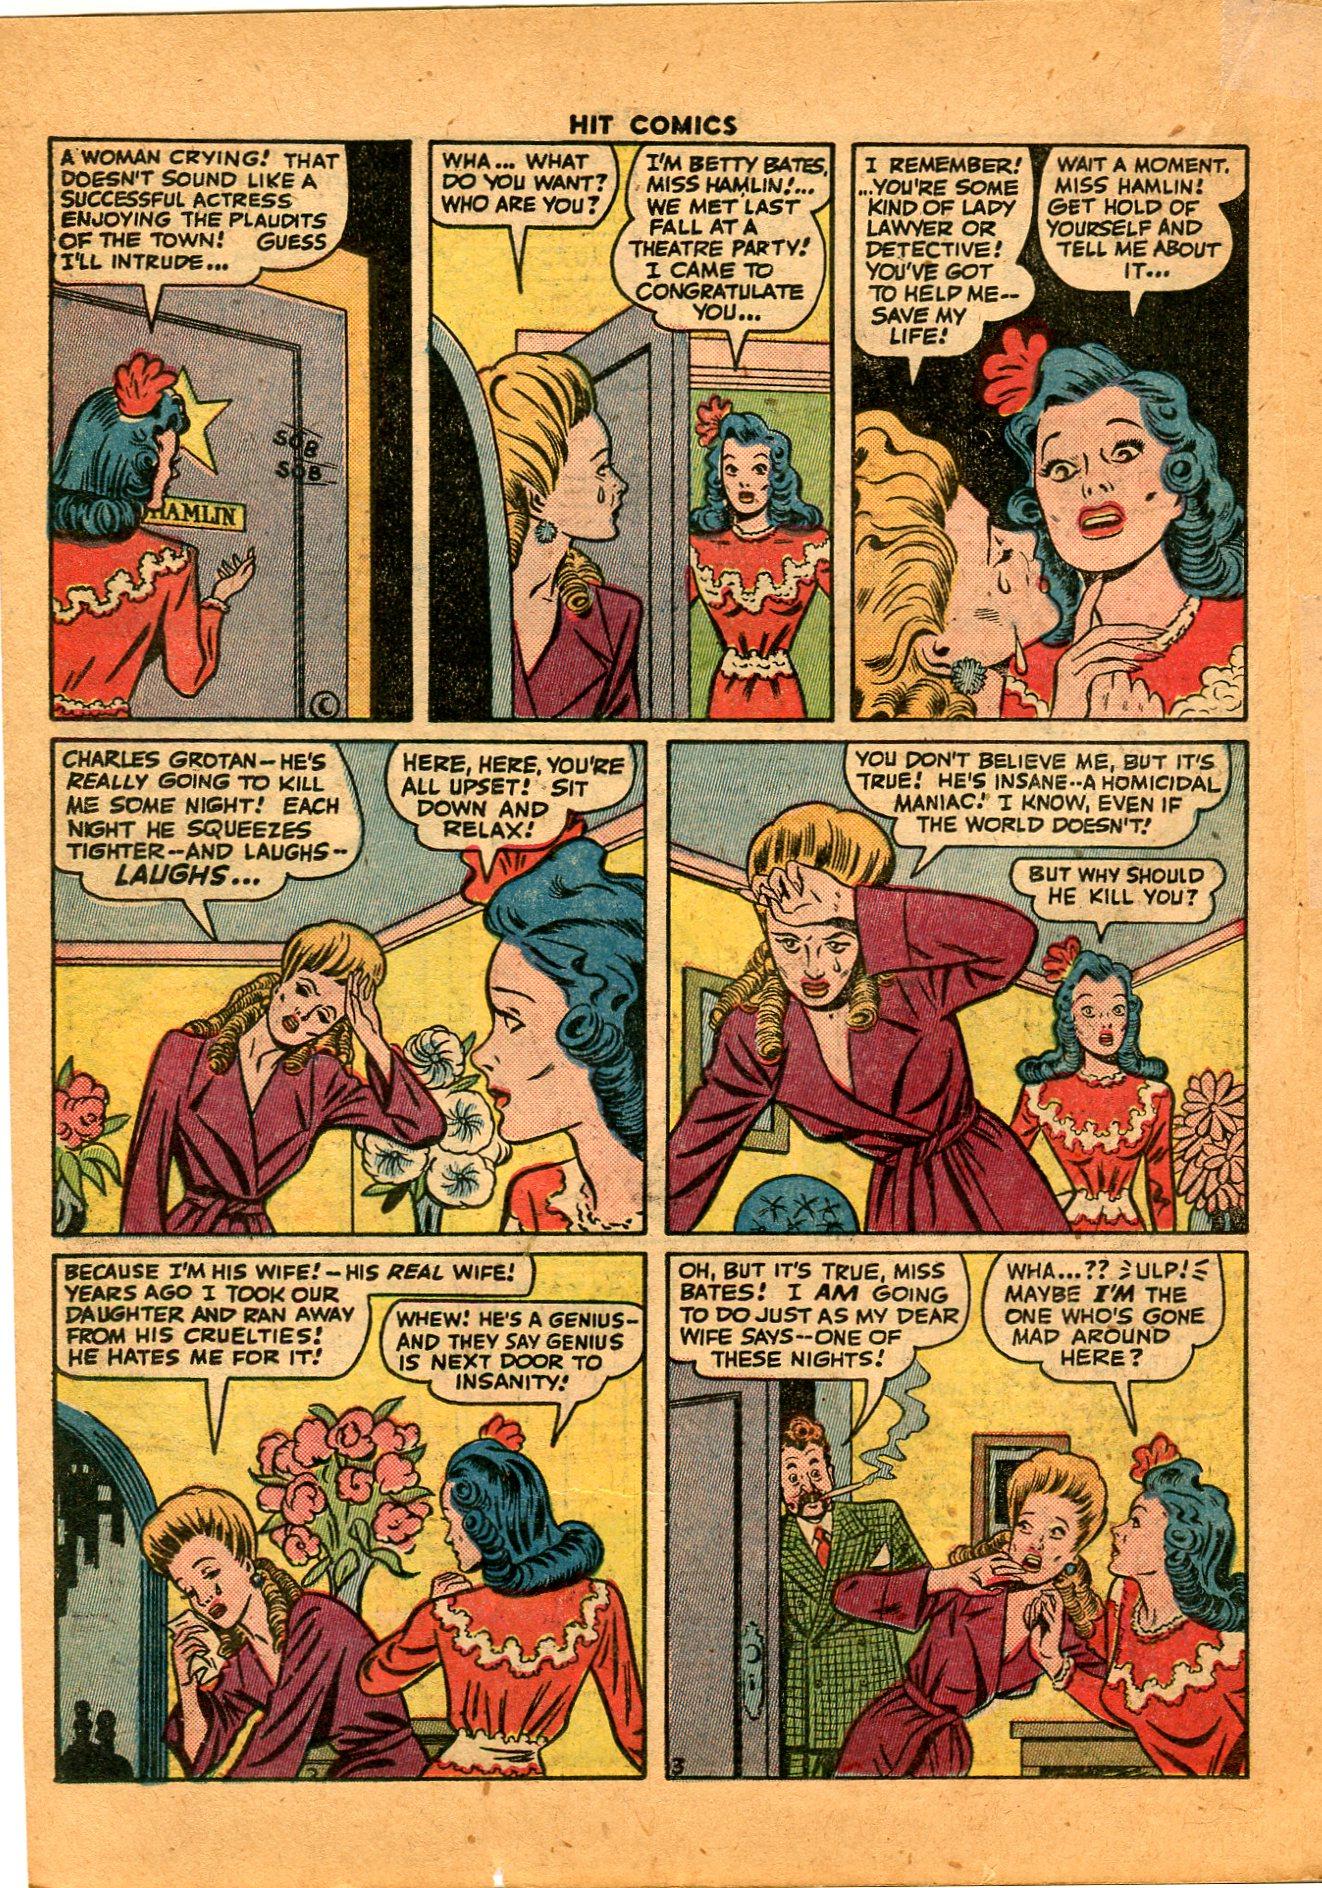 Read online Hit Comics comic -  Issue #35 - 32